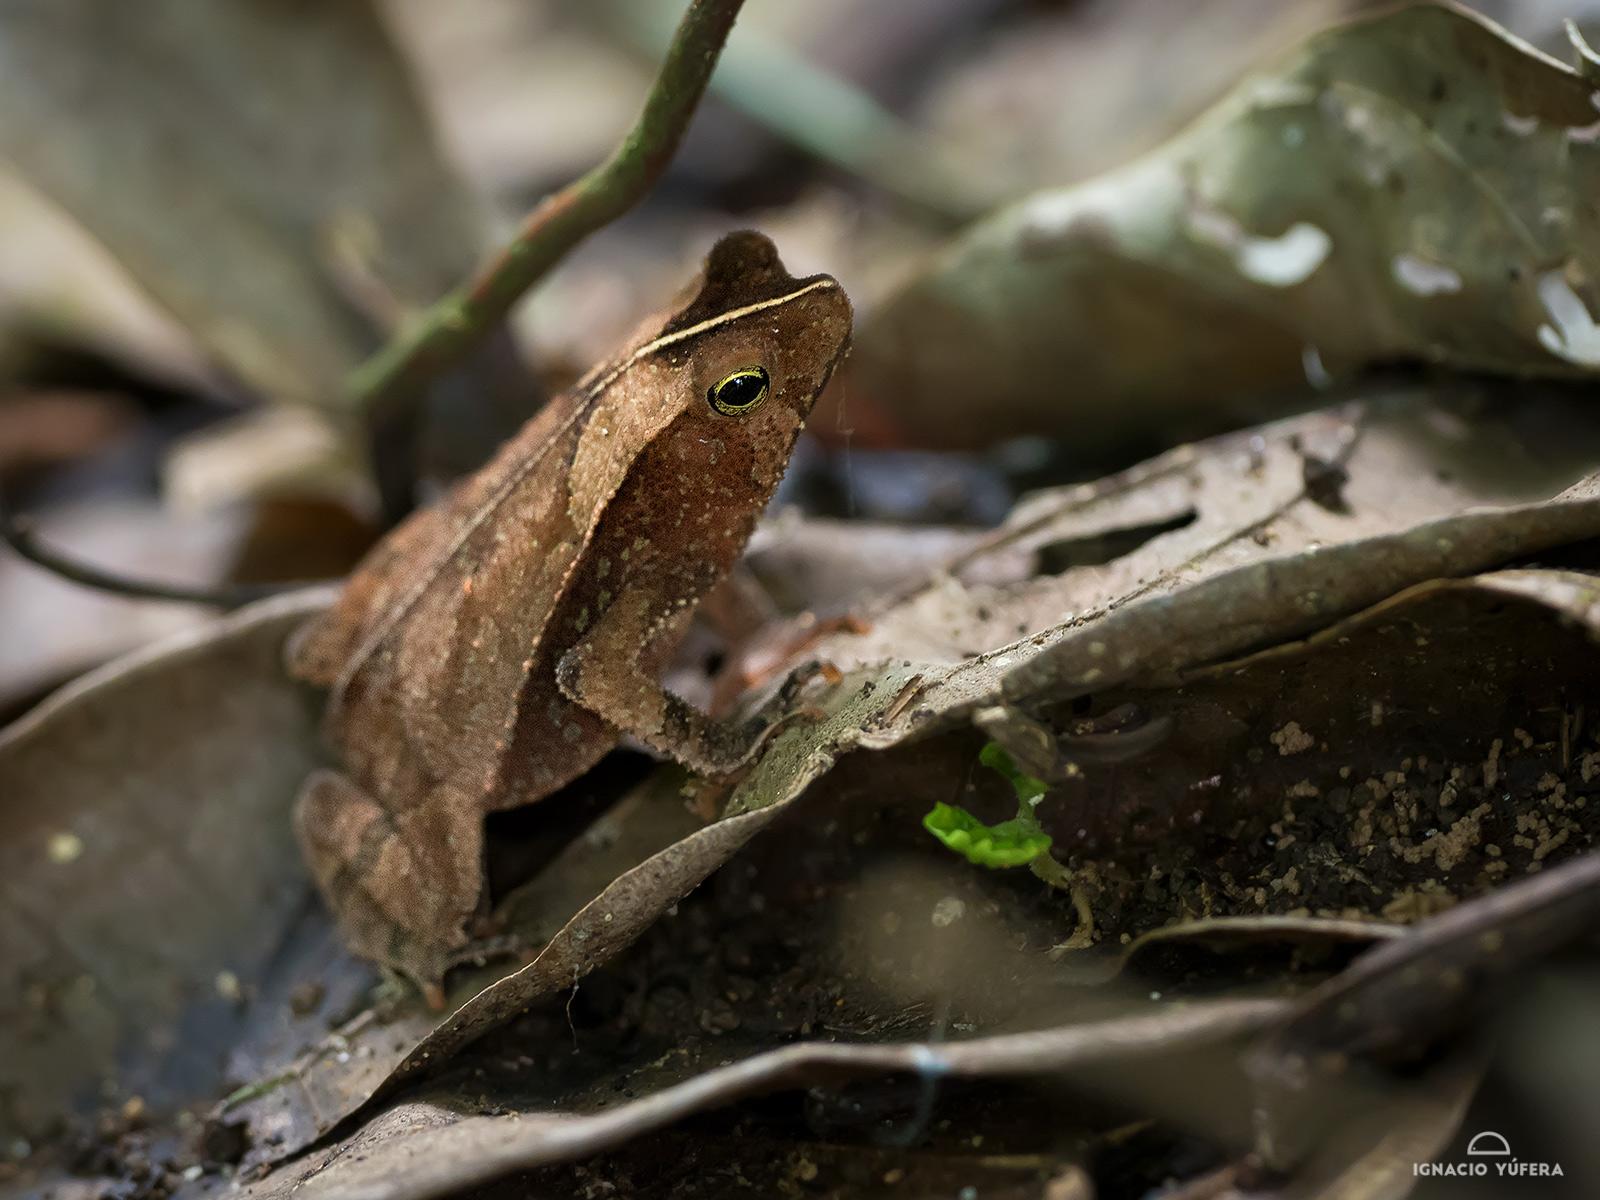 Leaf-litter toad (Rhinella alata), San Francisco reserve, Panama